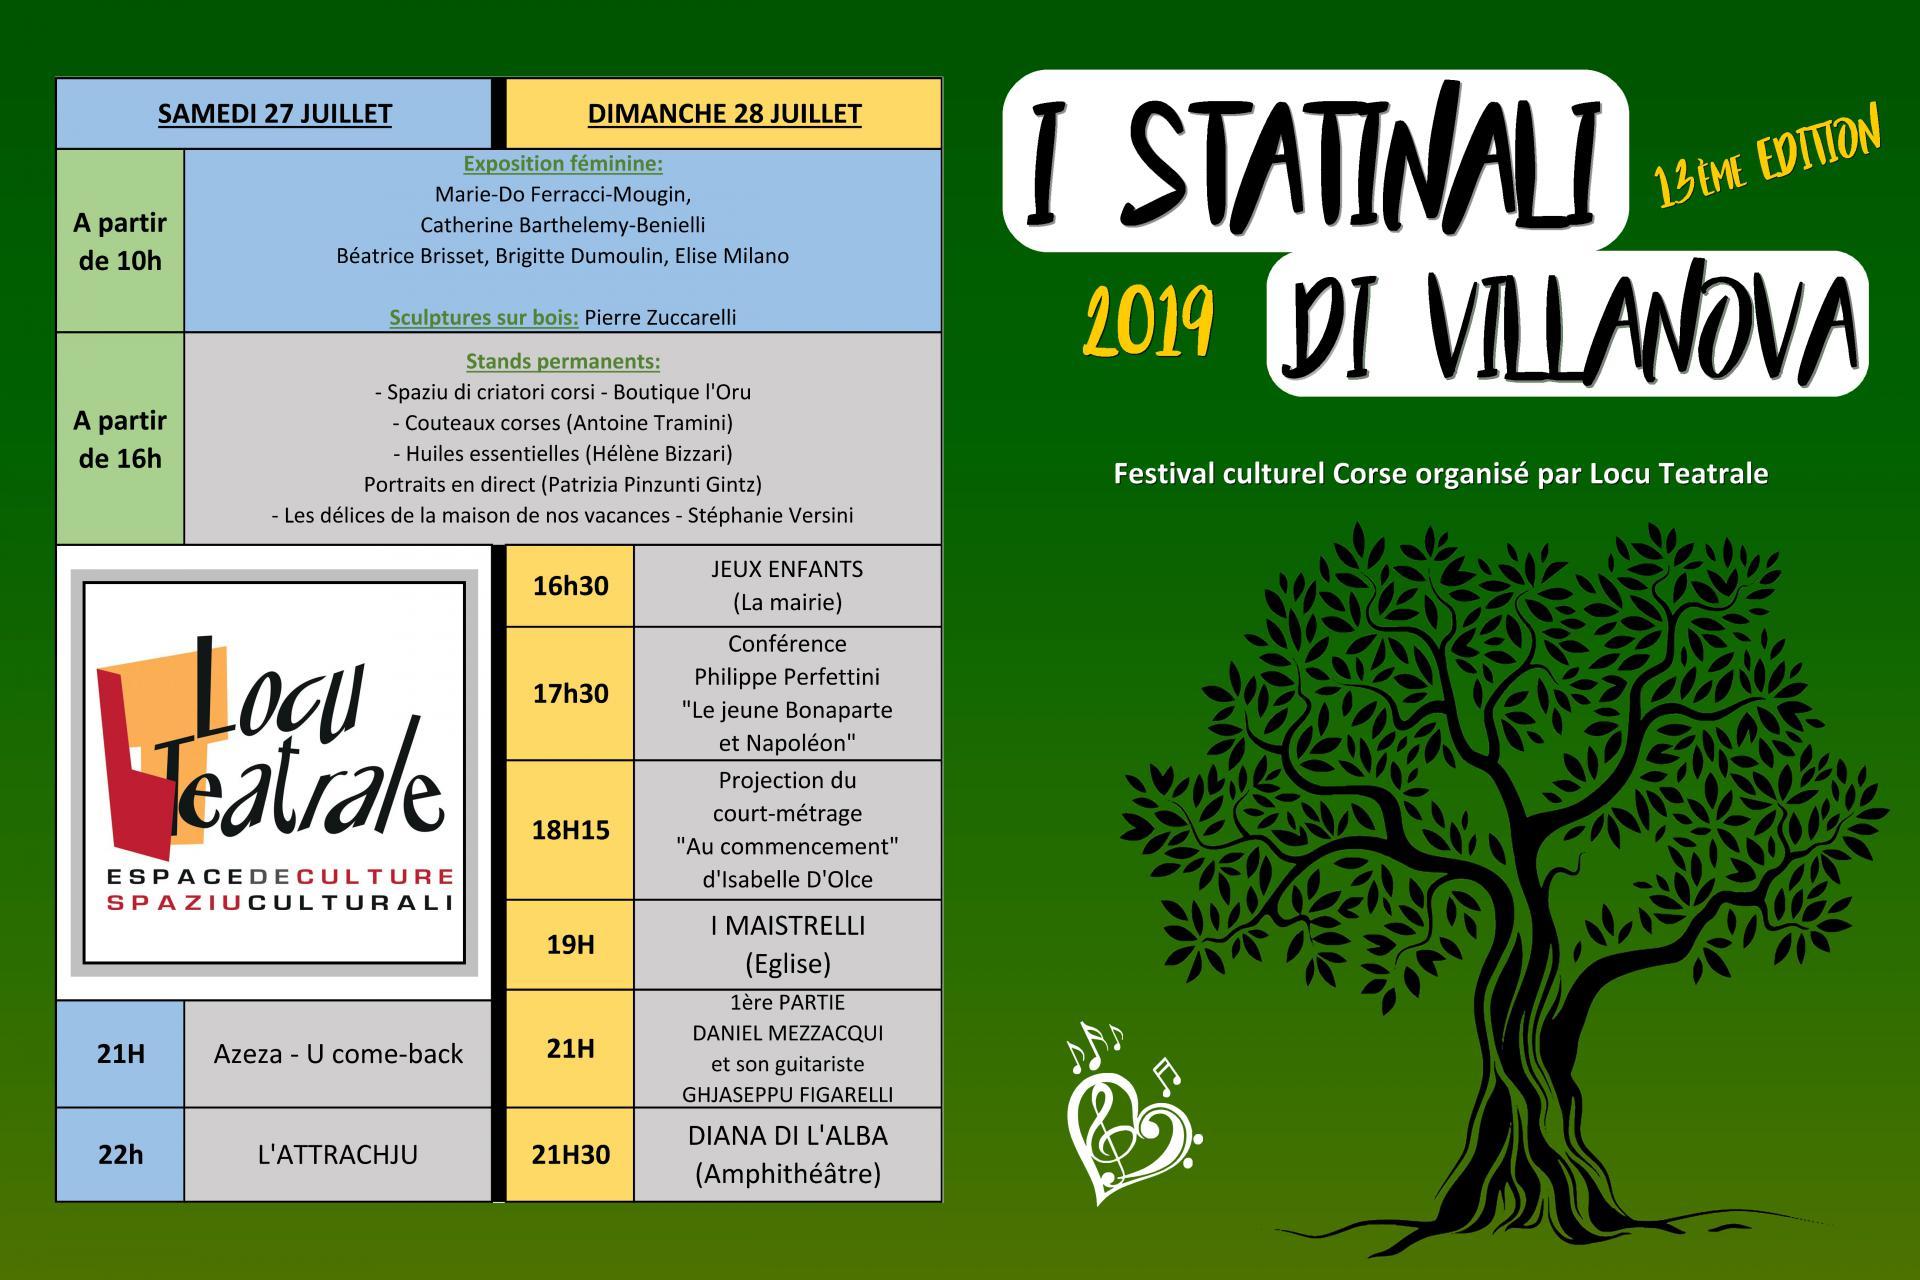 "13éme Édition du Festival ""I STATINALI DI VILLANOVA"""